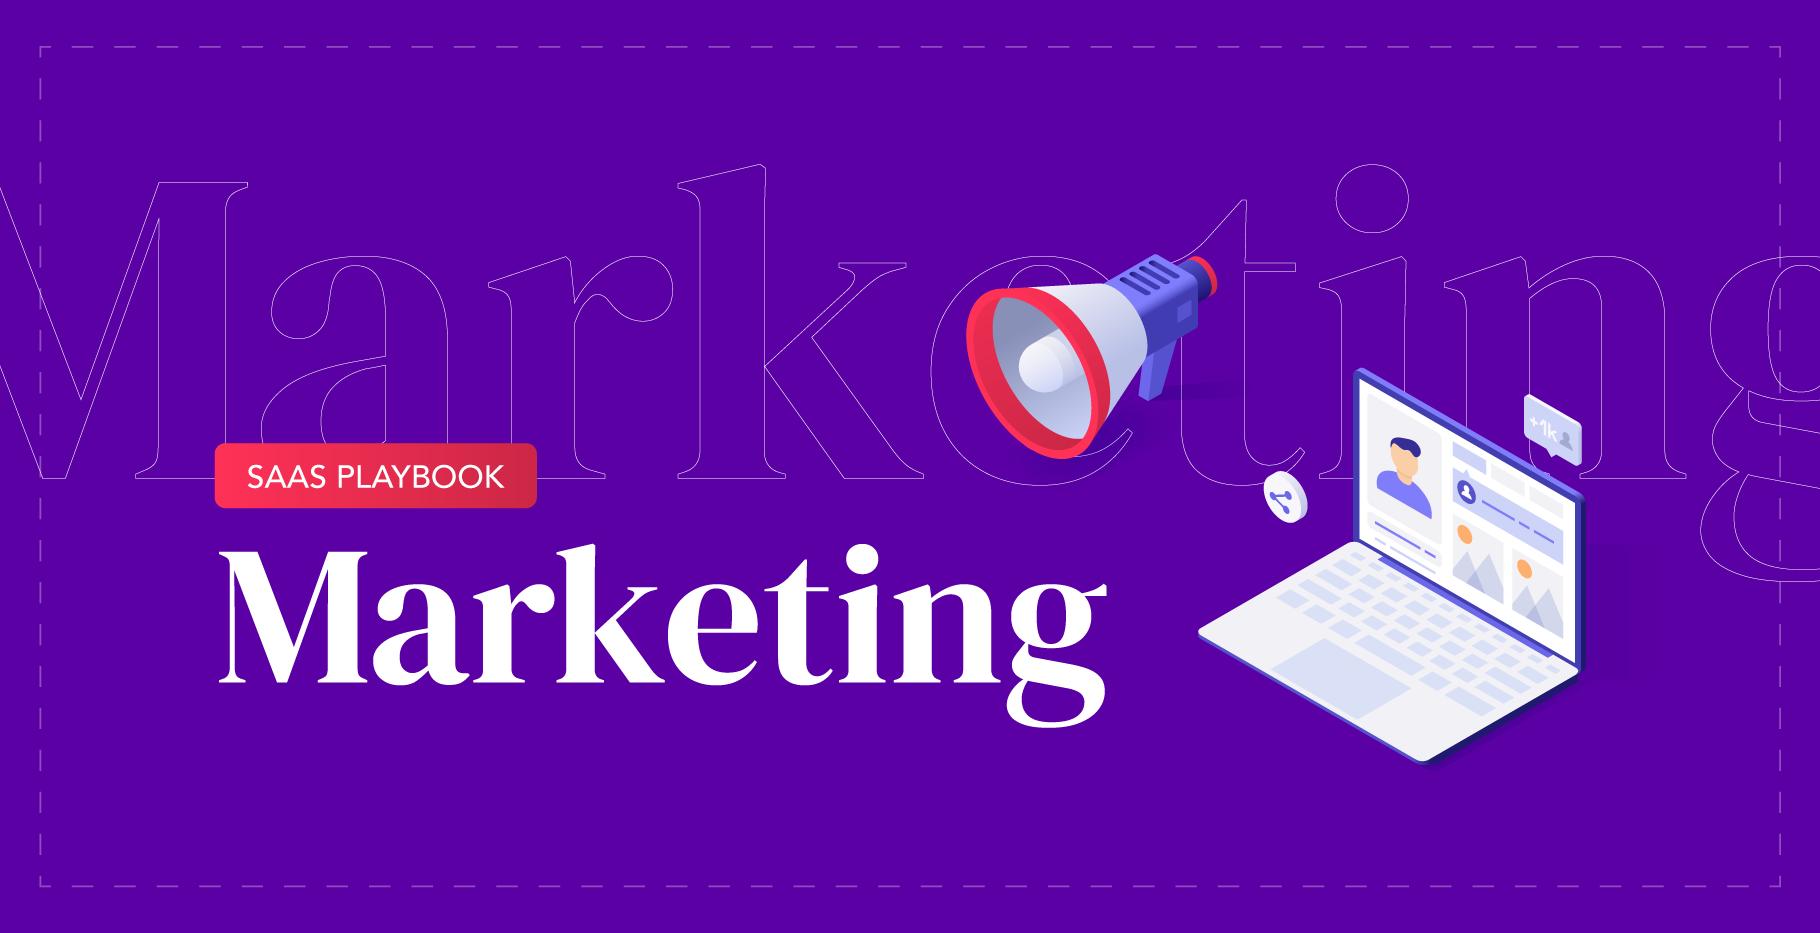 SaaS Playbook: Marketing